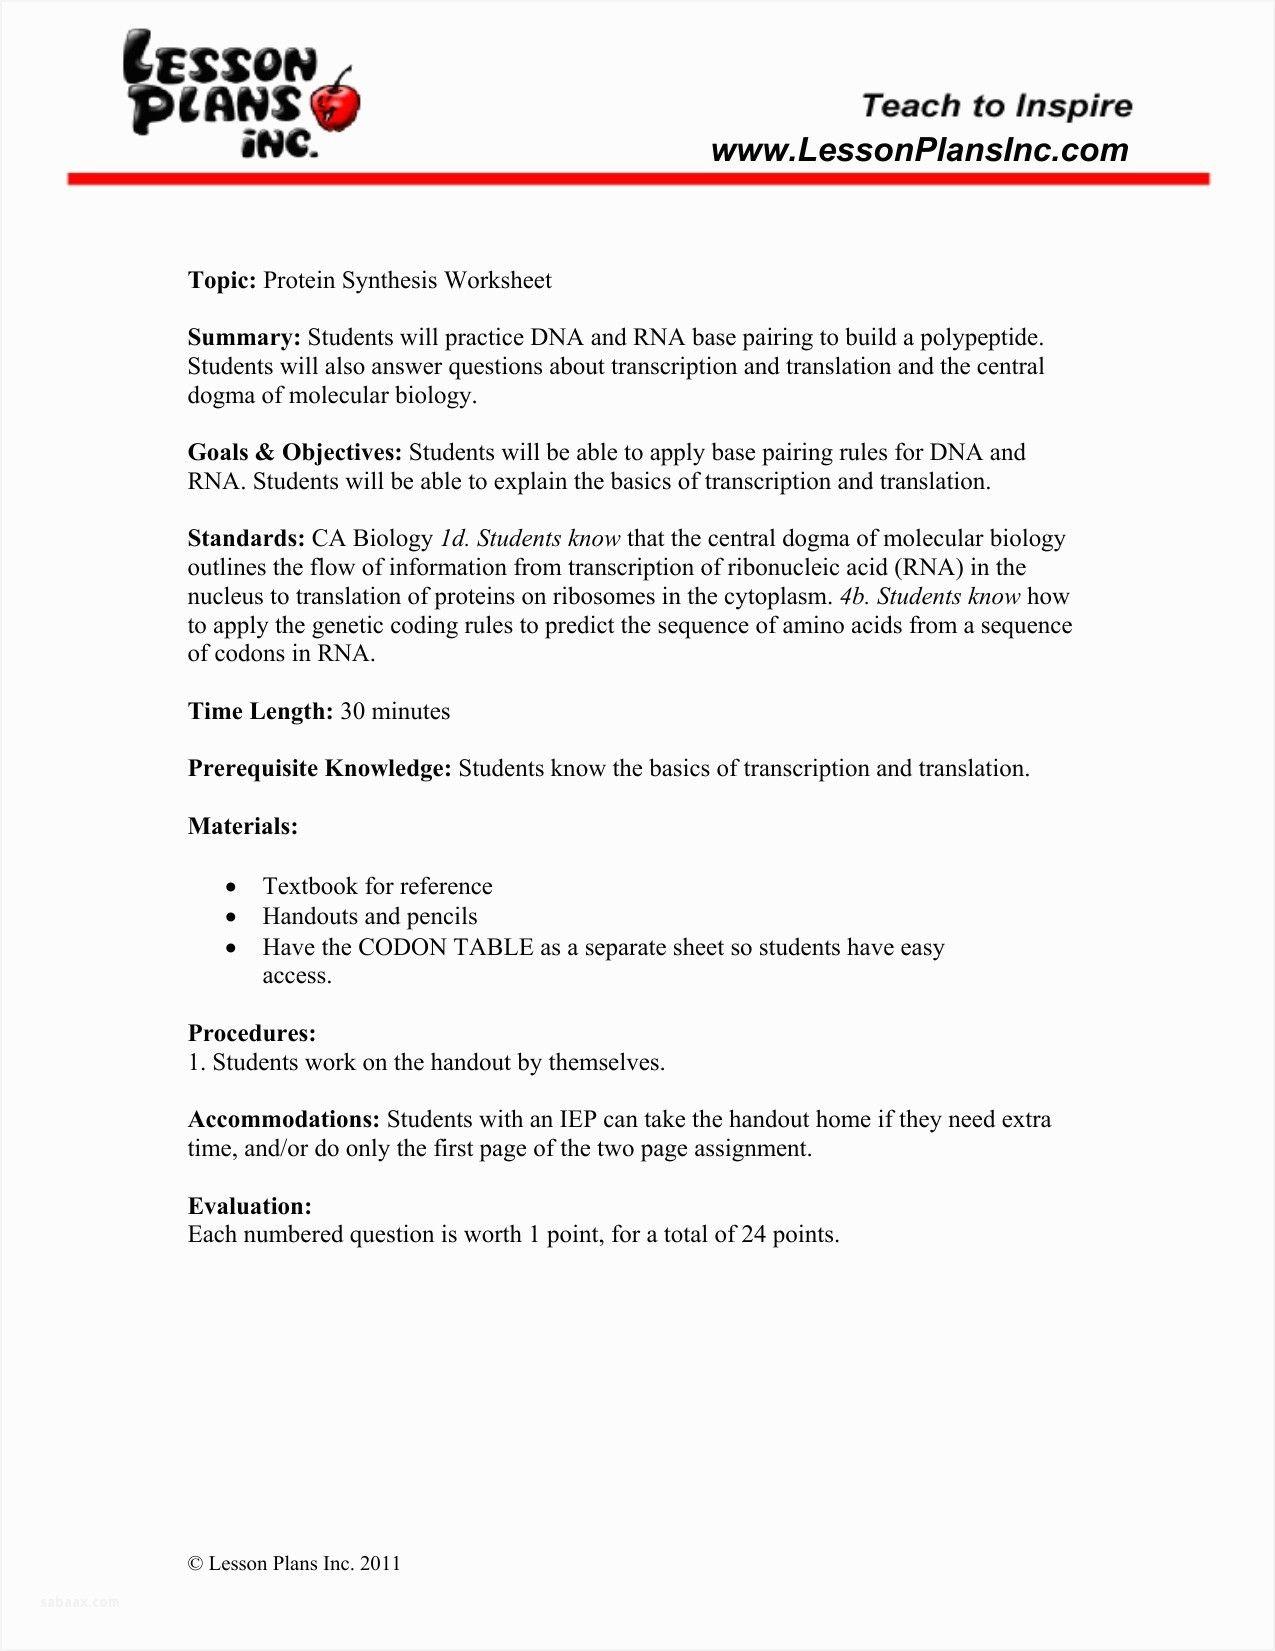 Mrna And Transcription Worksheet